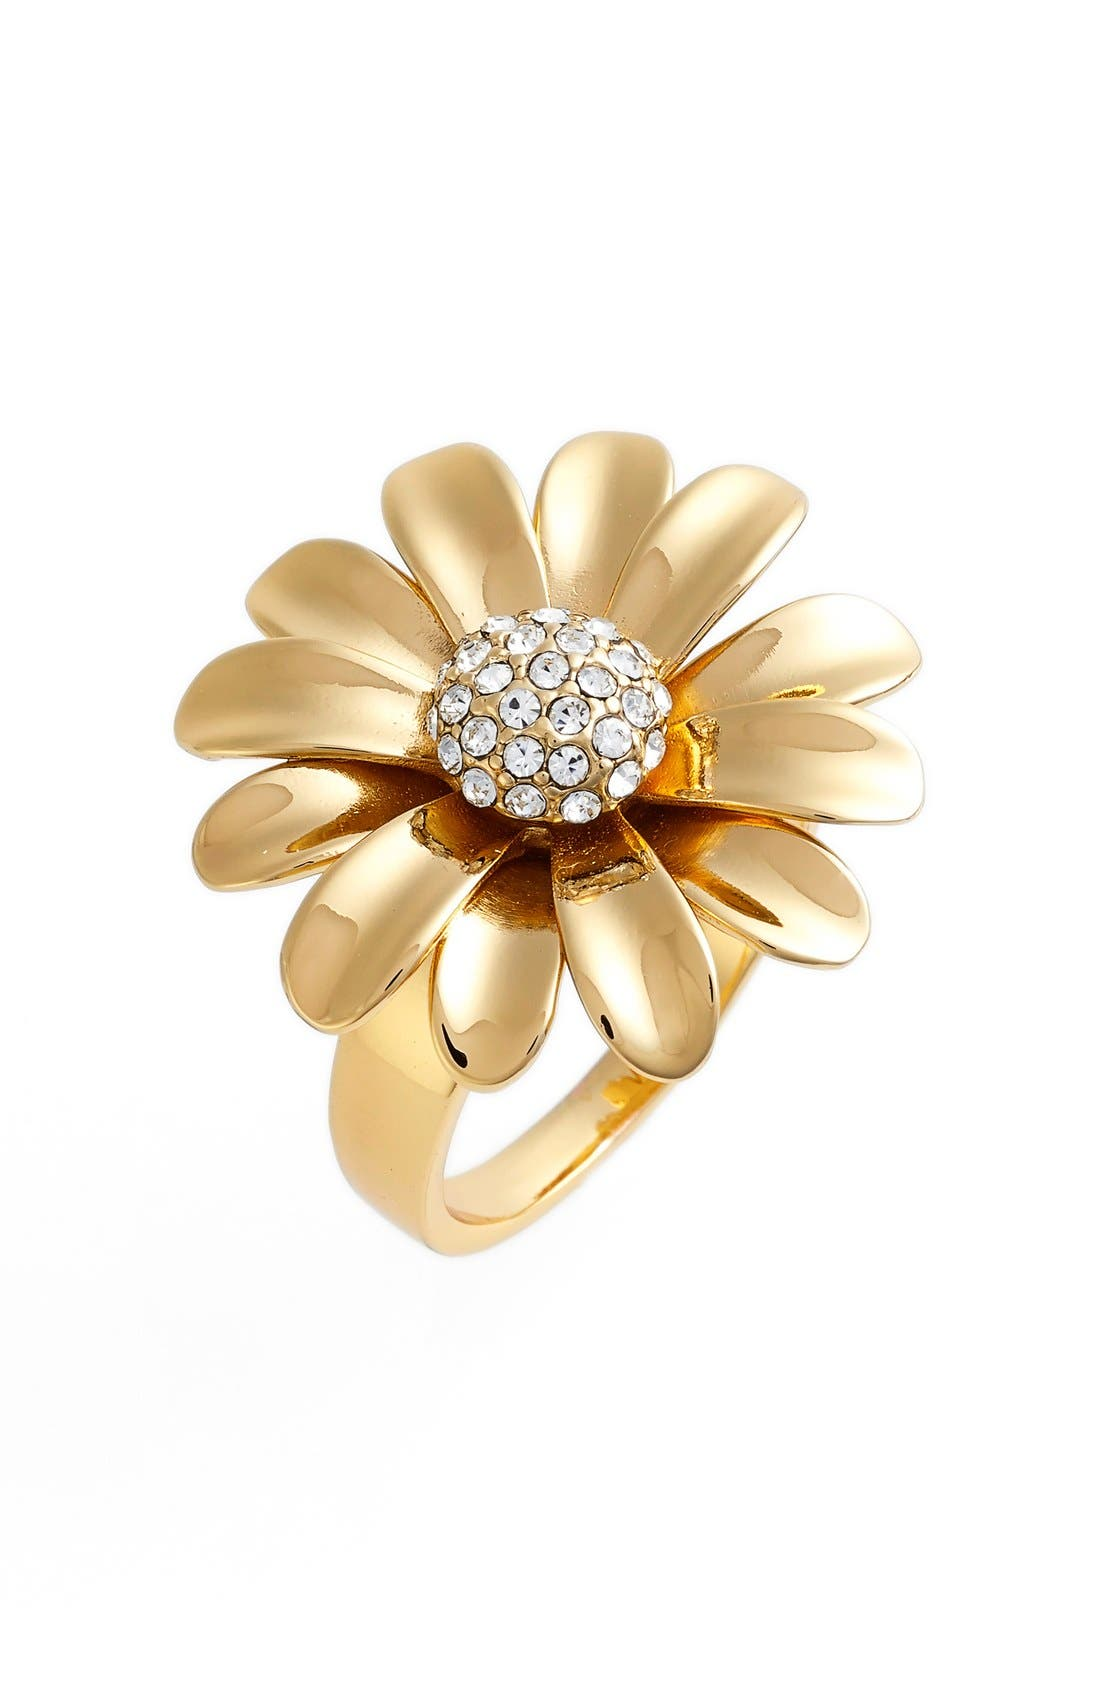 Alternate Image 1 Selected - kate spade new york 'dazzling daisies' statement ring